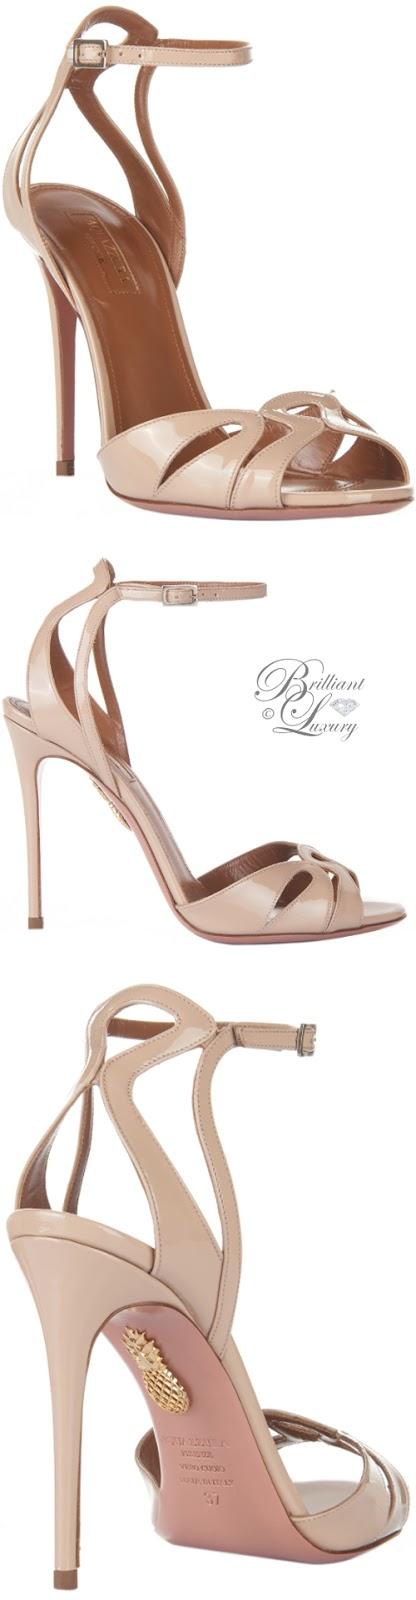 Brilliant Luxury ♦ Aquazzura Zola Sandals